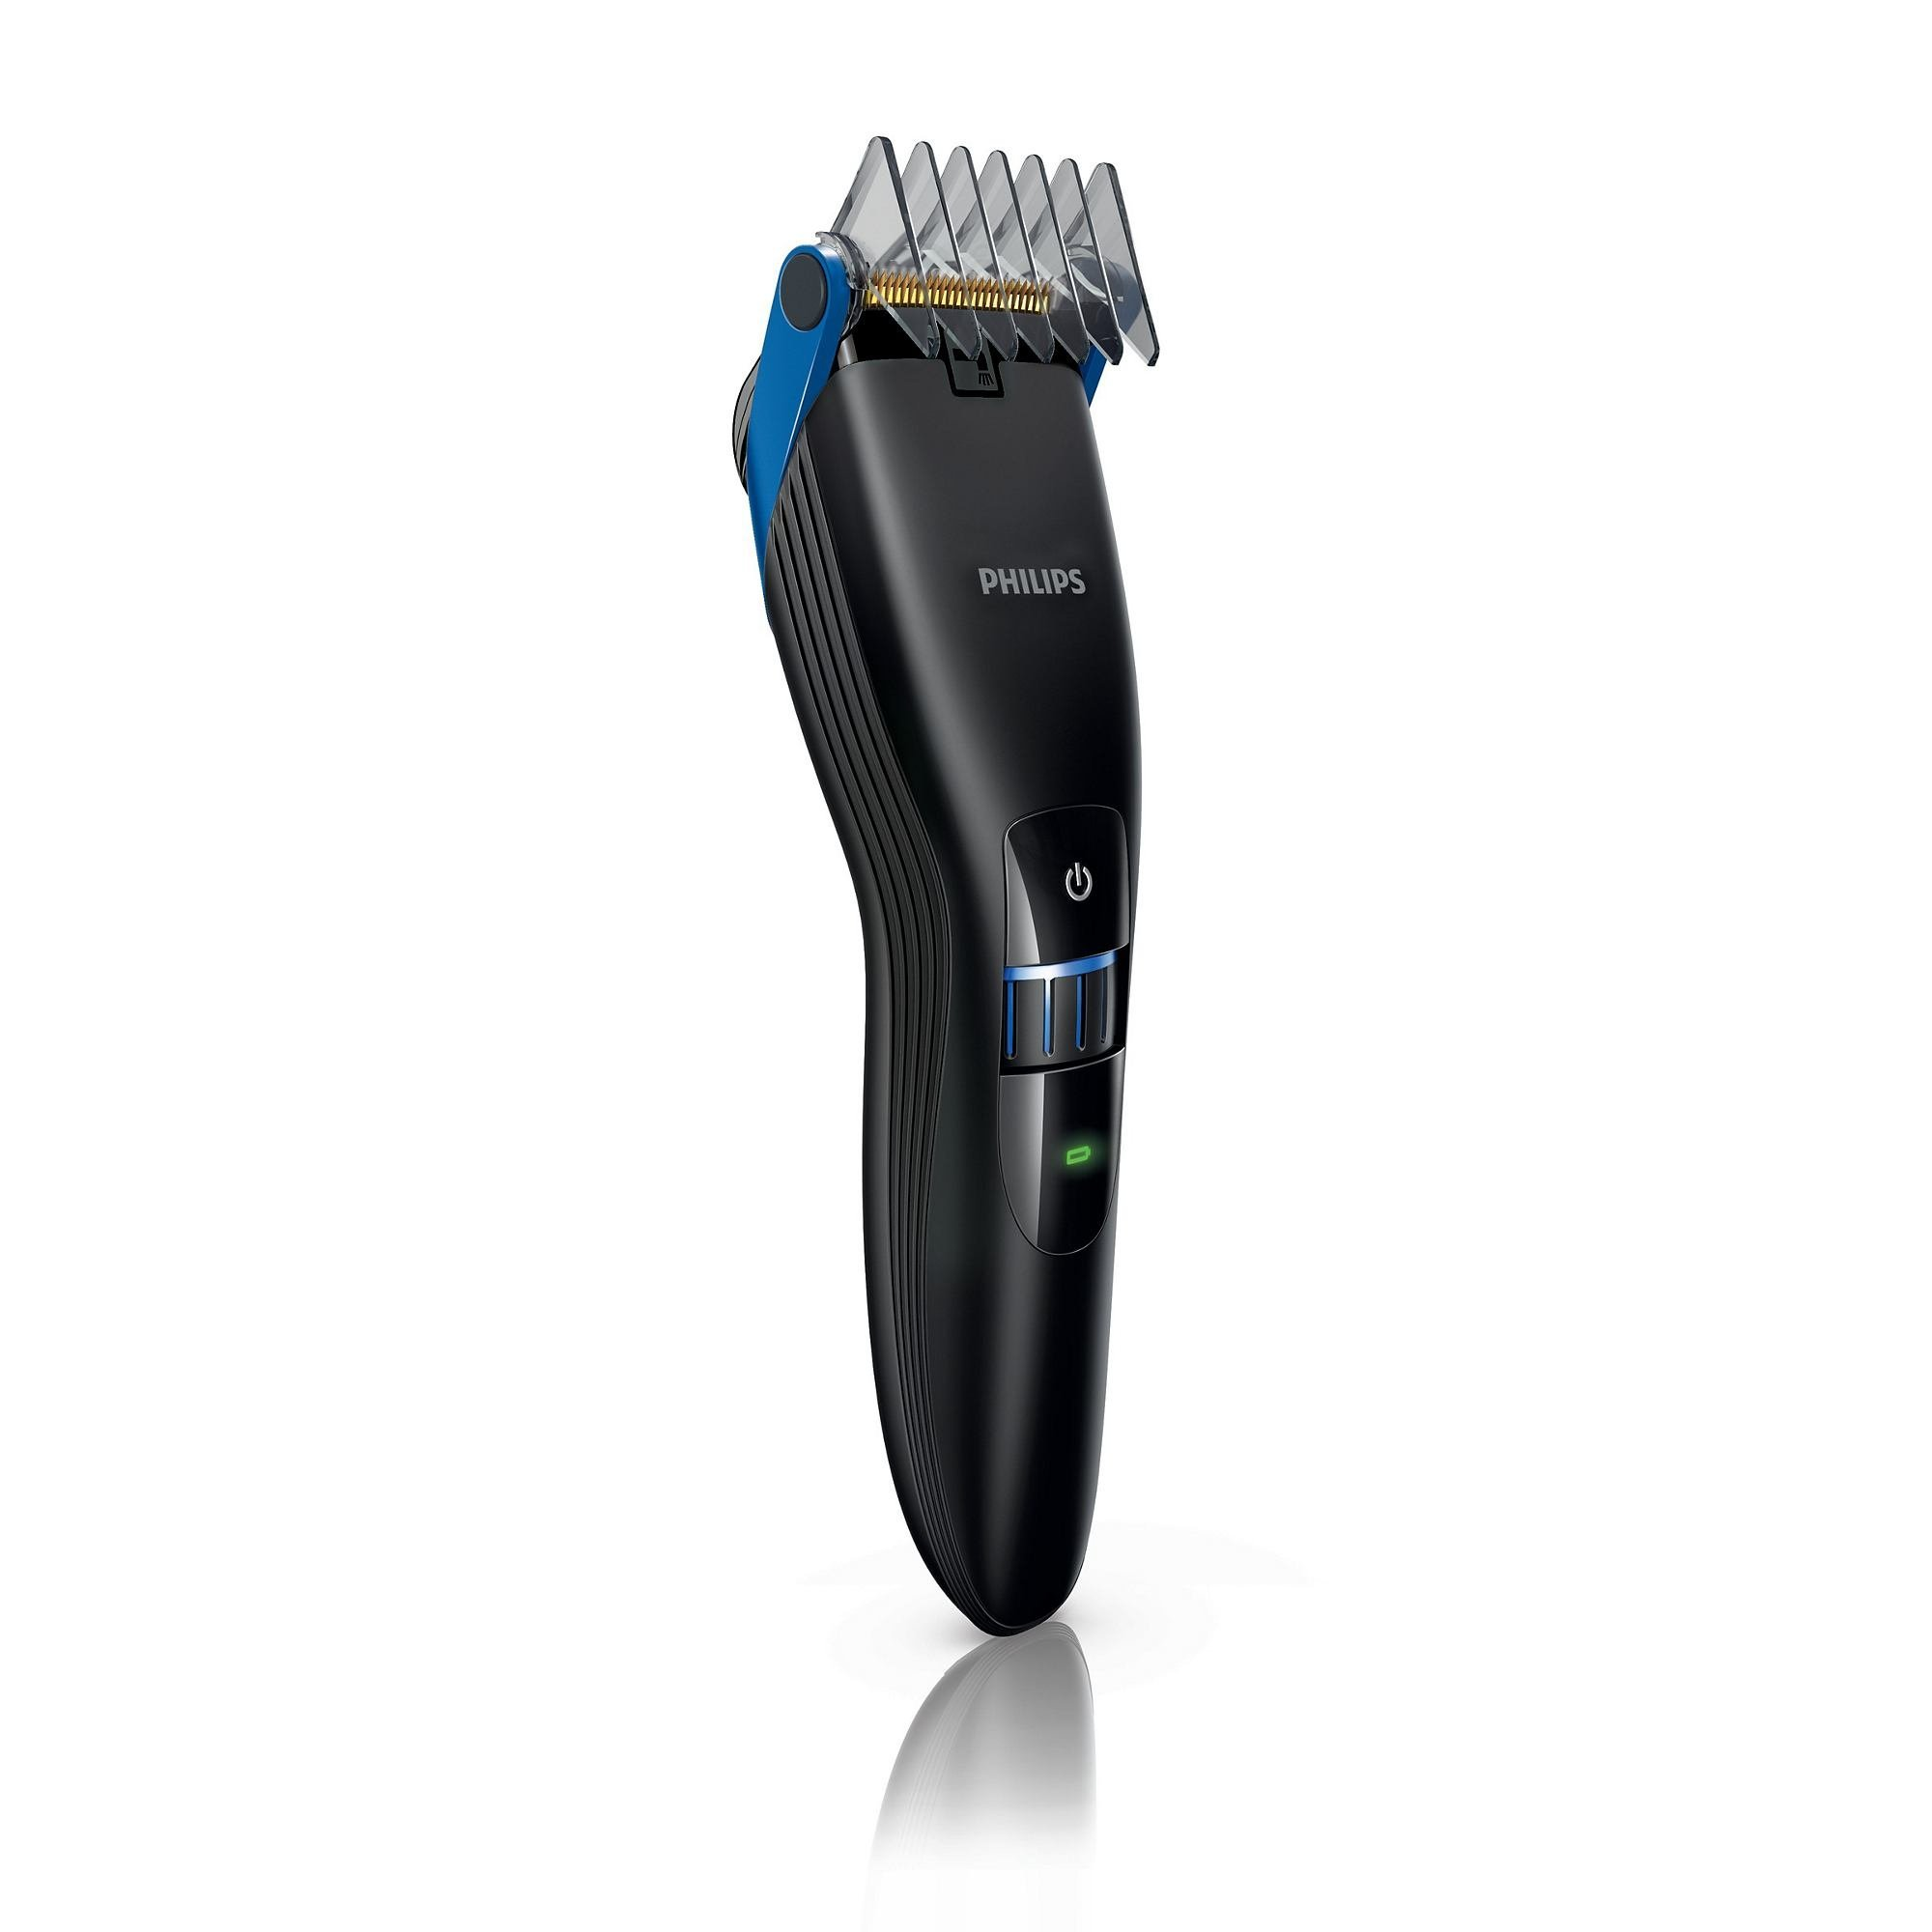 Машинки для стрижки волос Philips Elmarket 663000.000